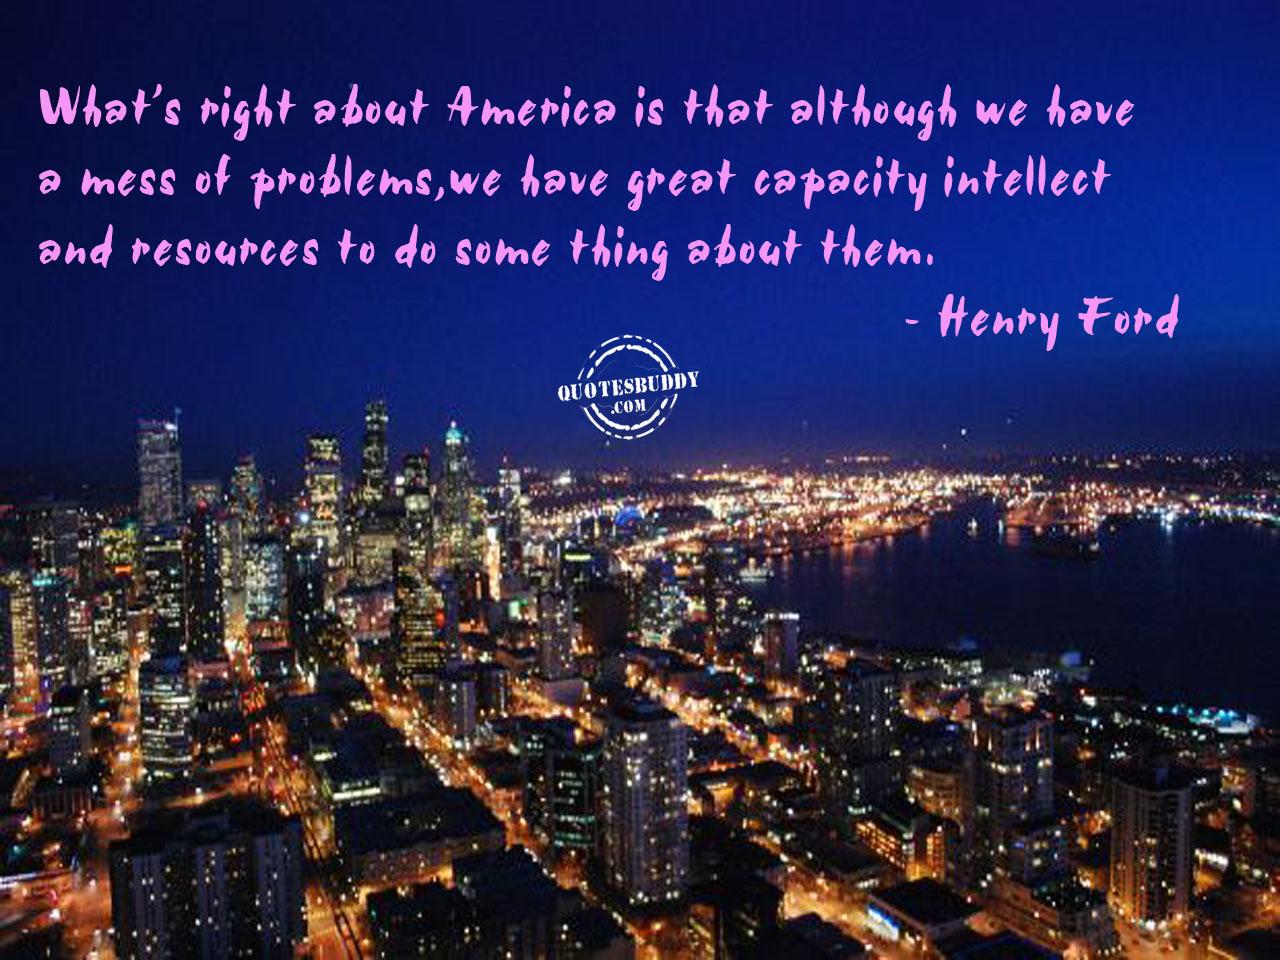 America quote #1